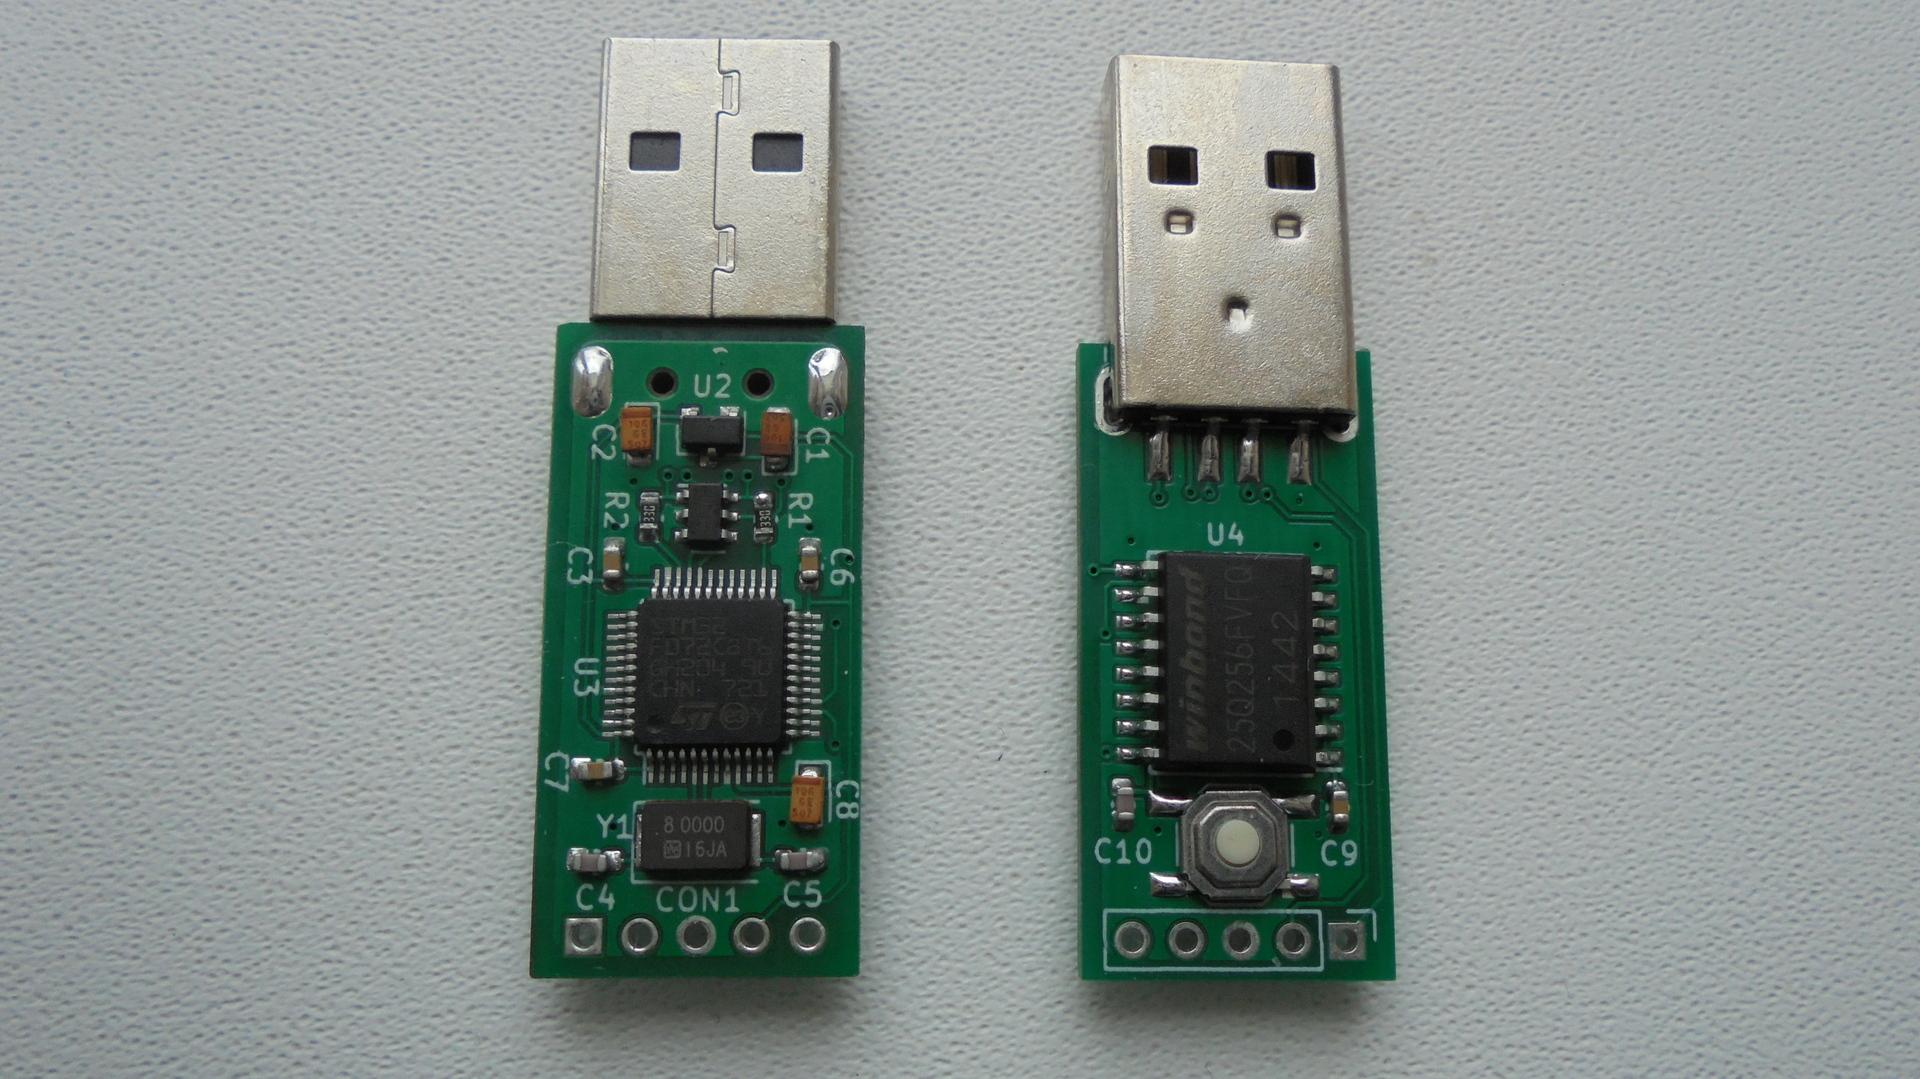 PocketAdmin – Keystroke Injection Device